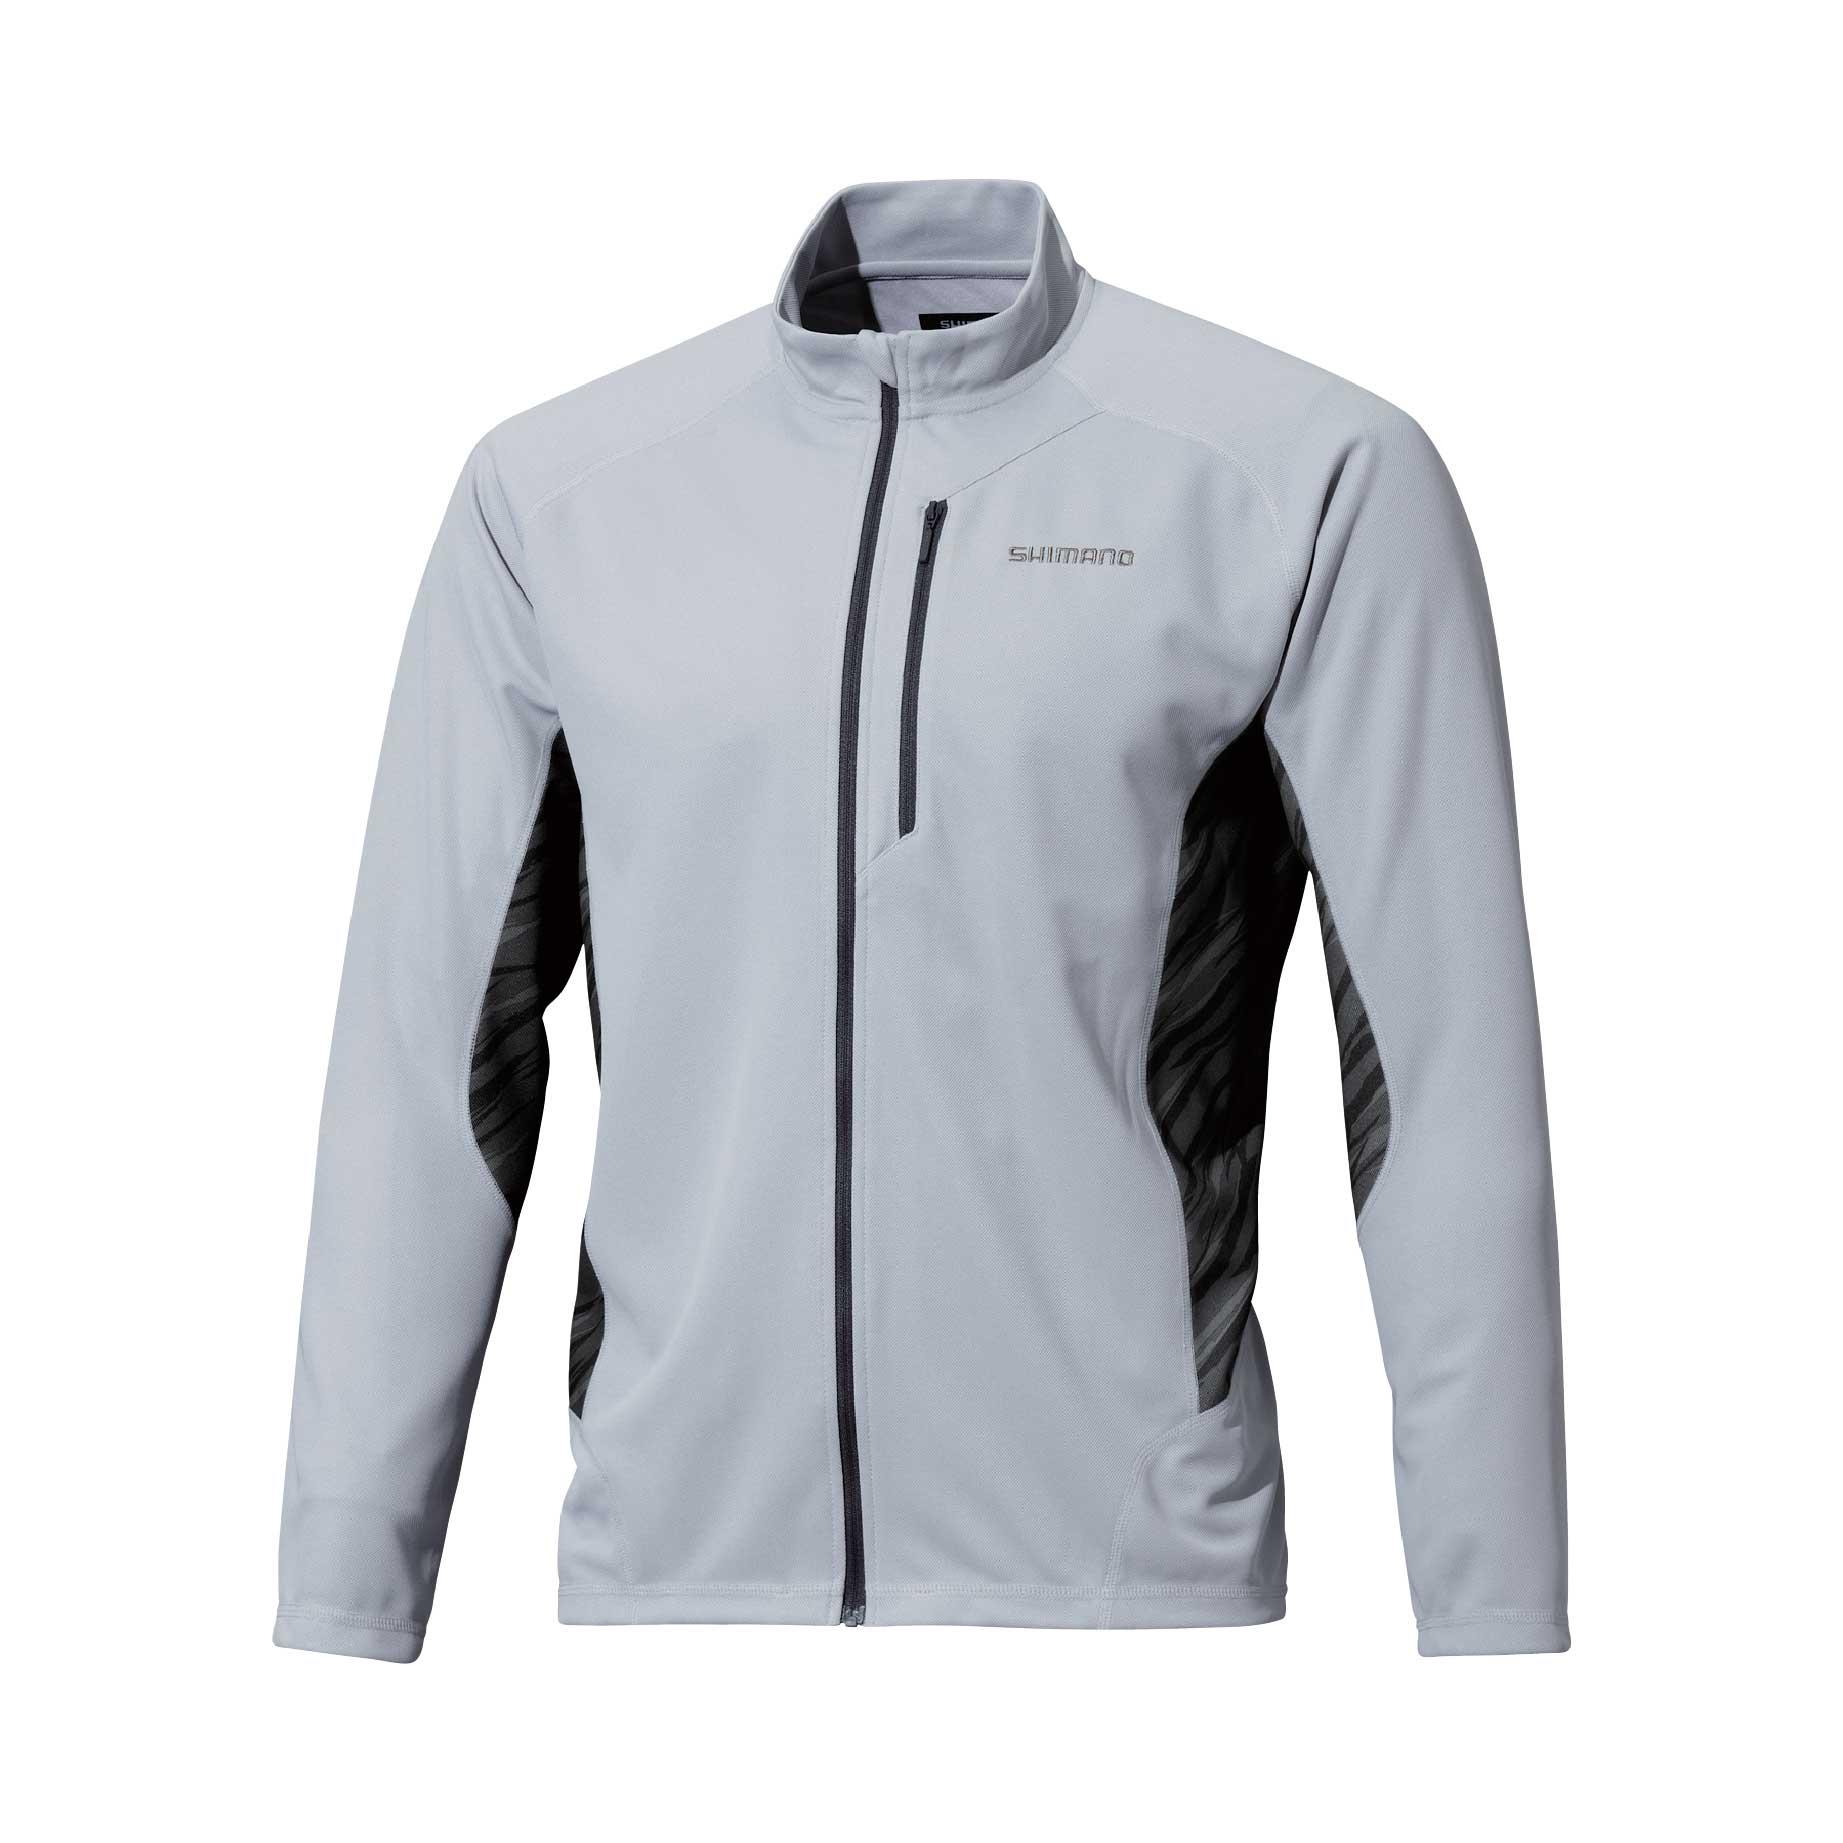 Sh 090n shimano black long sleeve shirt oftpancing for Shimano fishing shirts